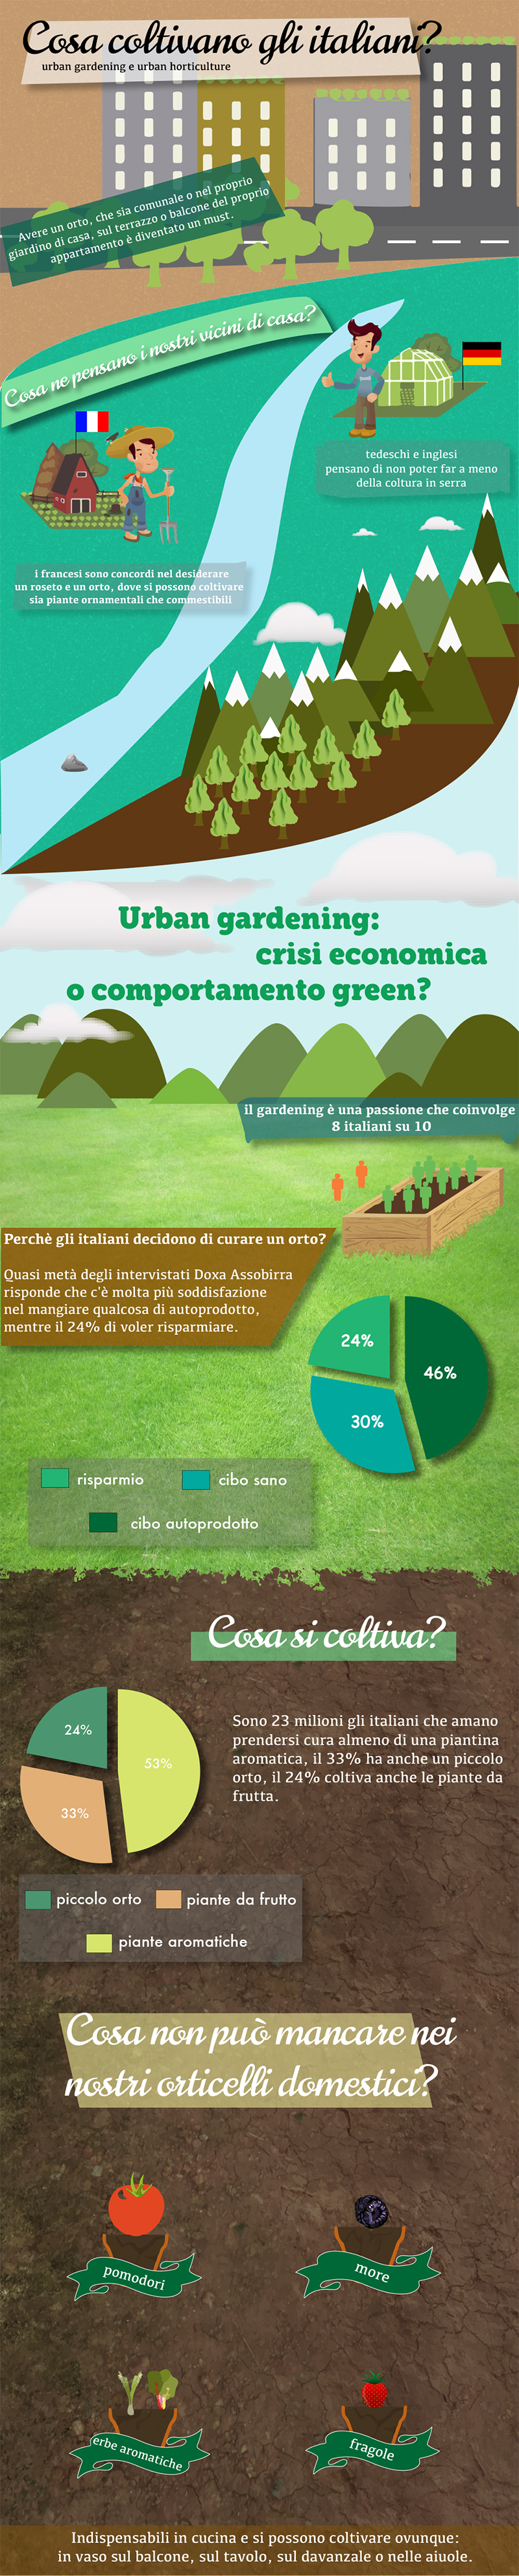 urban gardening infographic